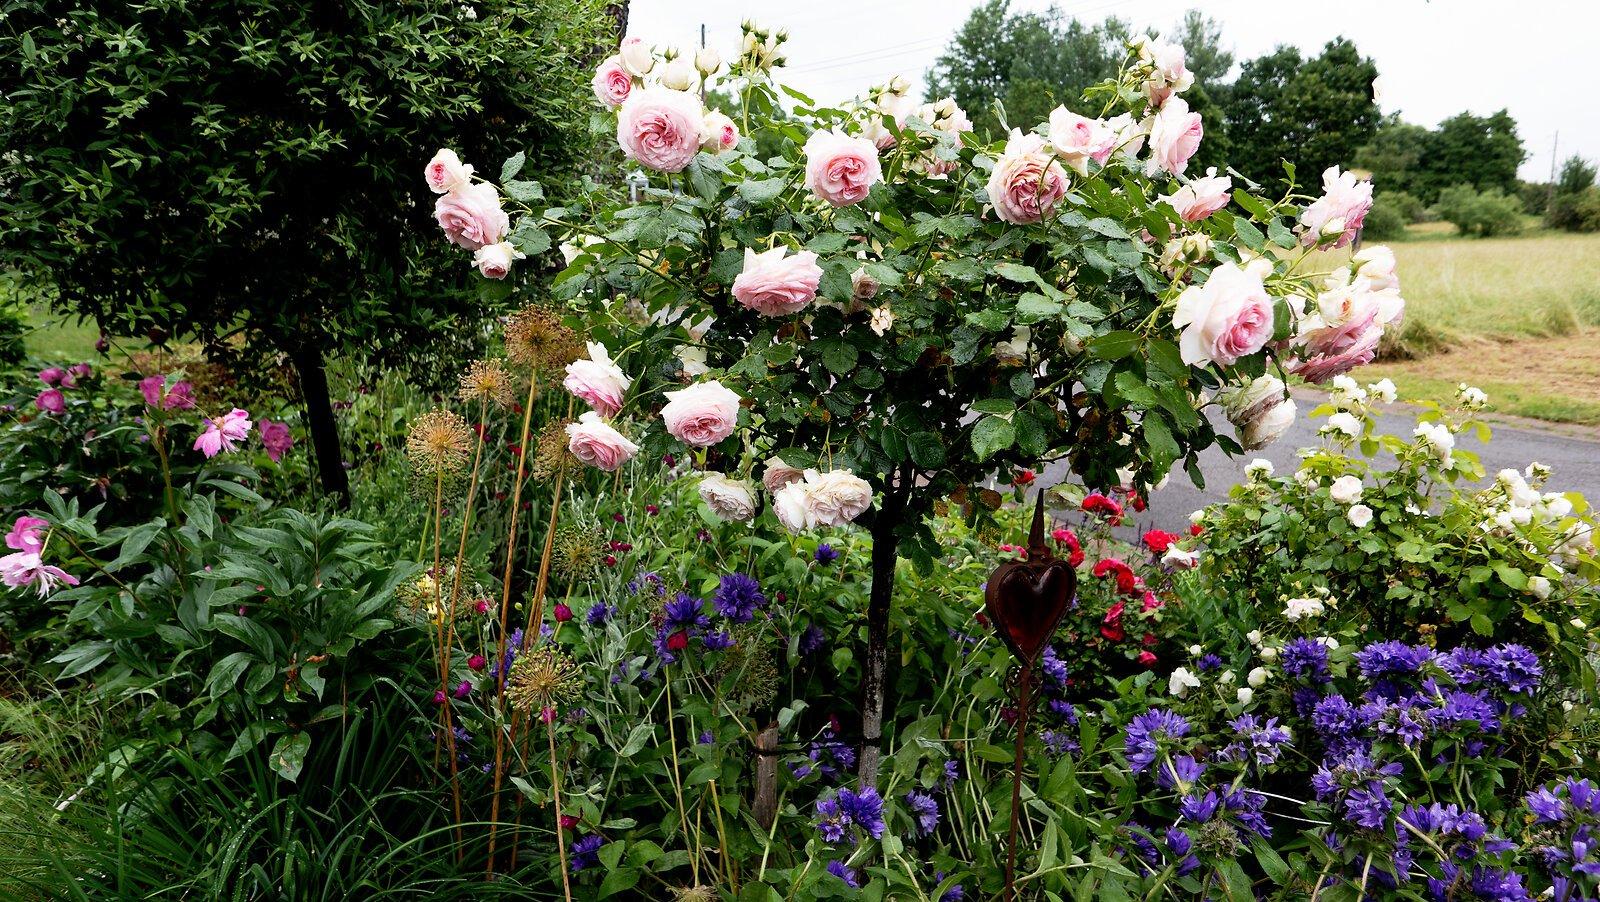 1schöner Garten.jpg